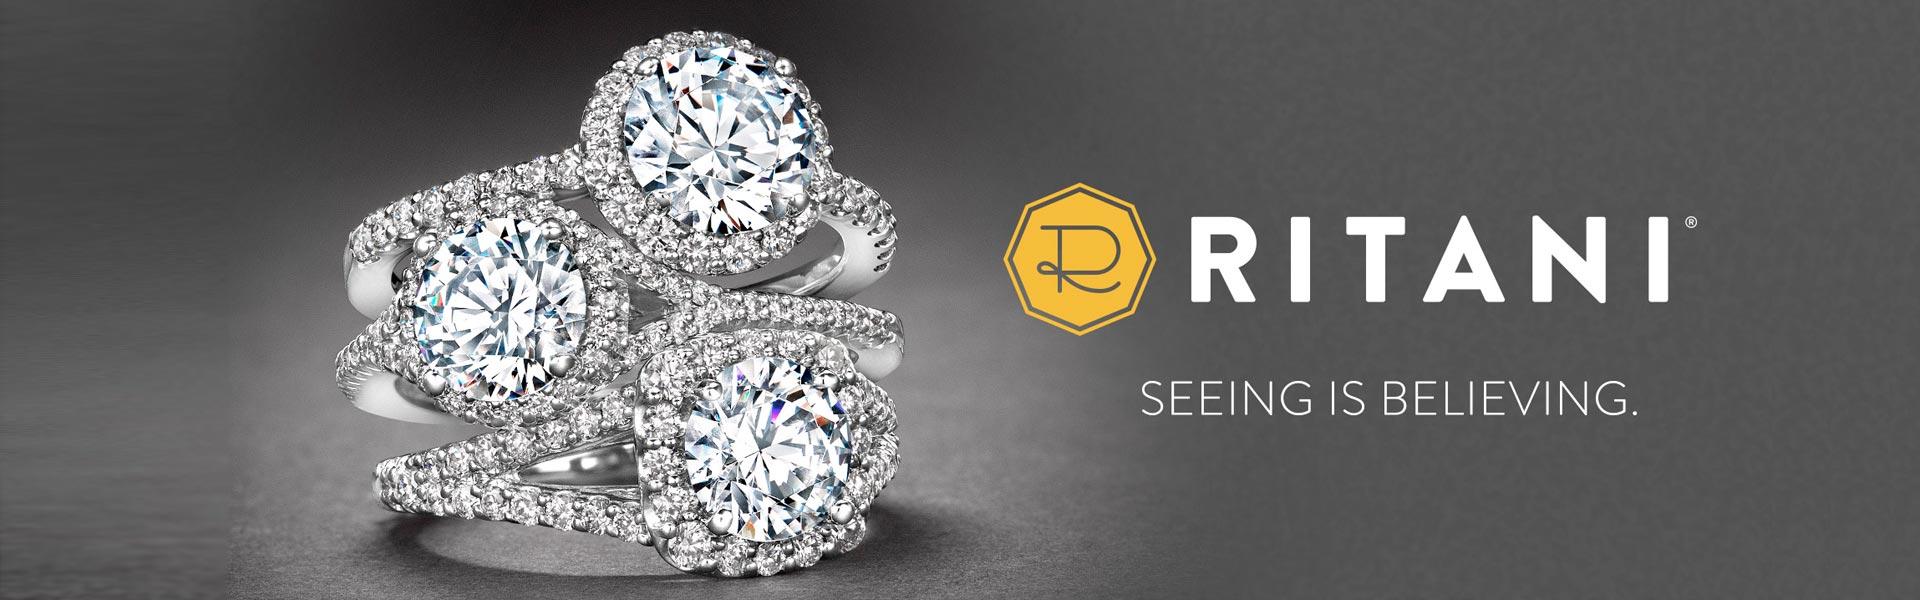 The eureka diamond - Diamond Search